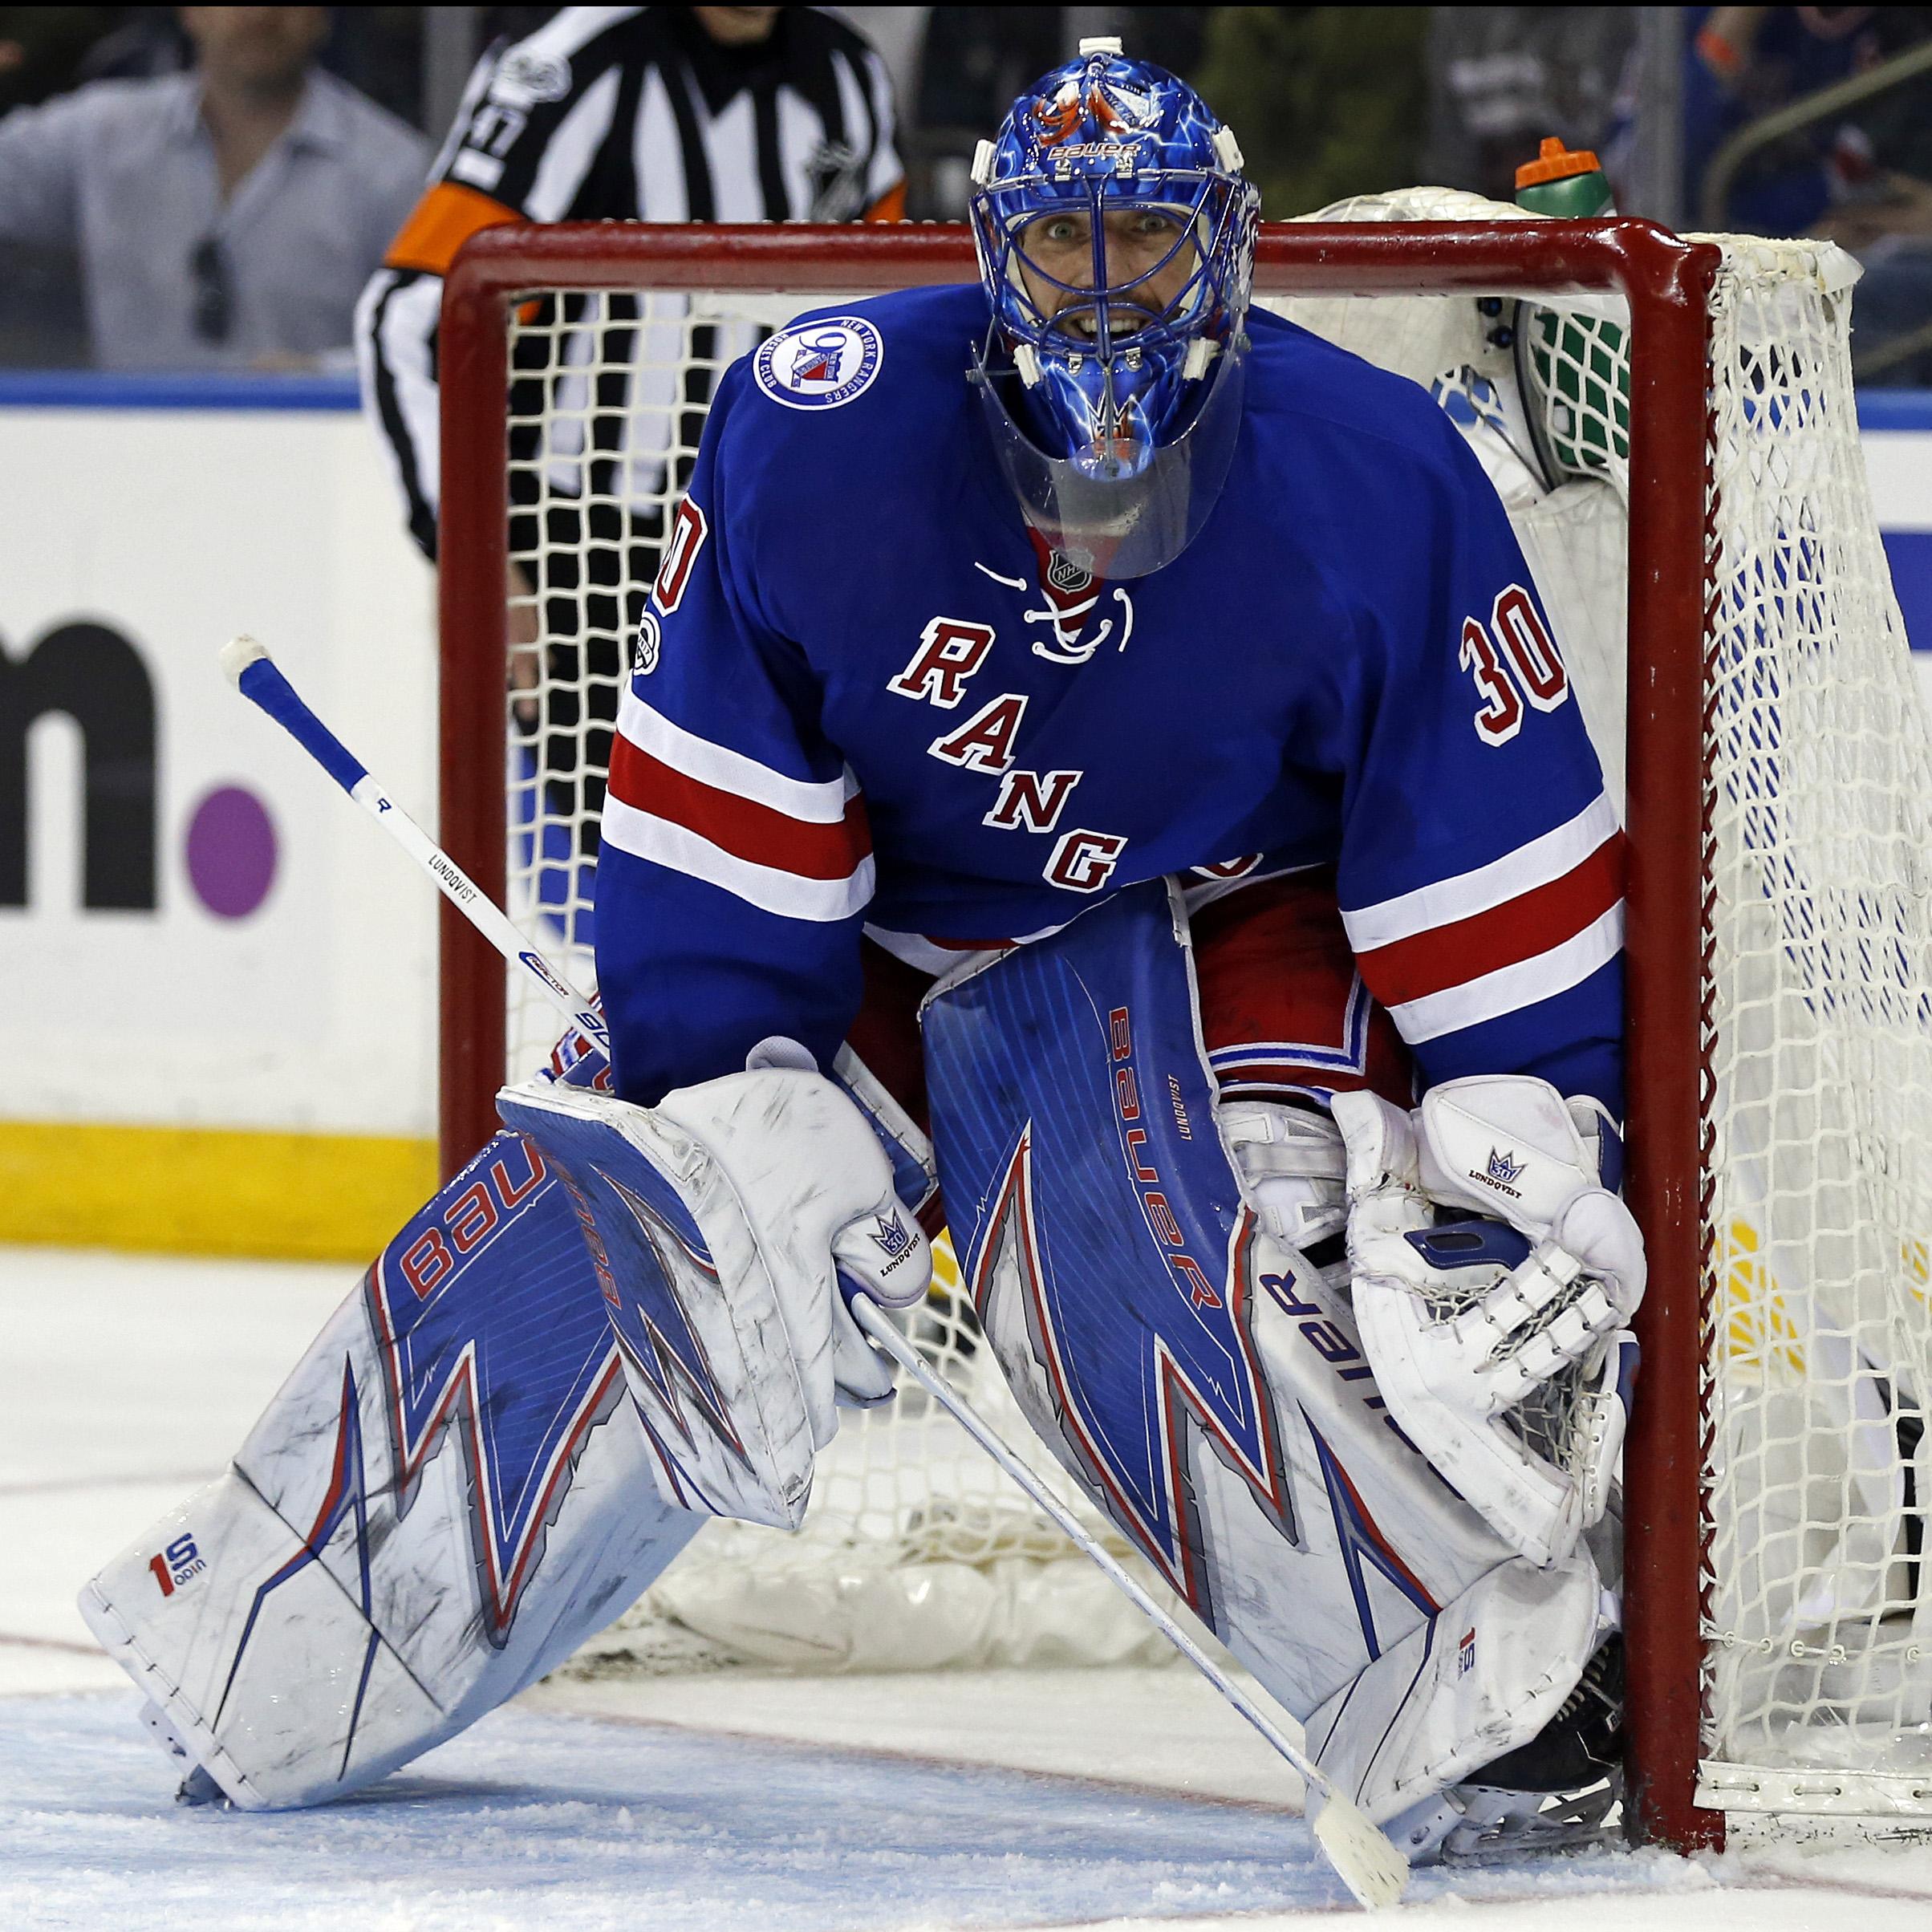 New York Rangers Henrik Lundqvist S Top 5 Moments Against The Devils